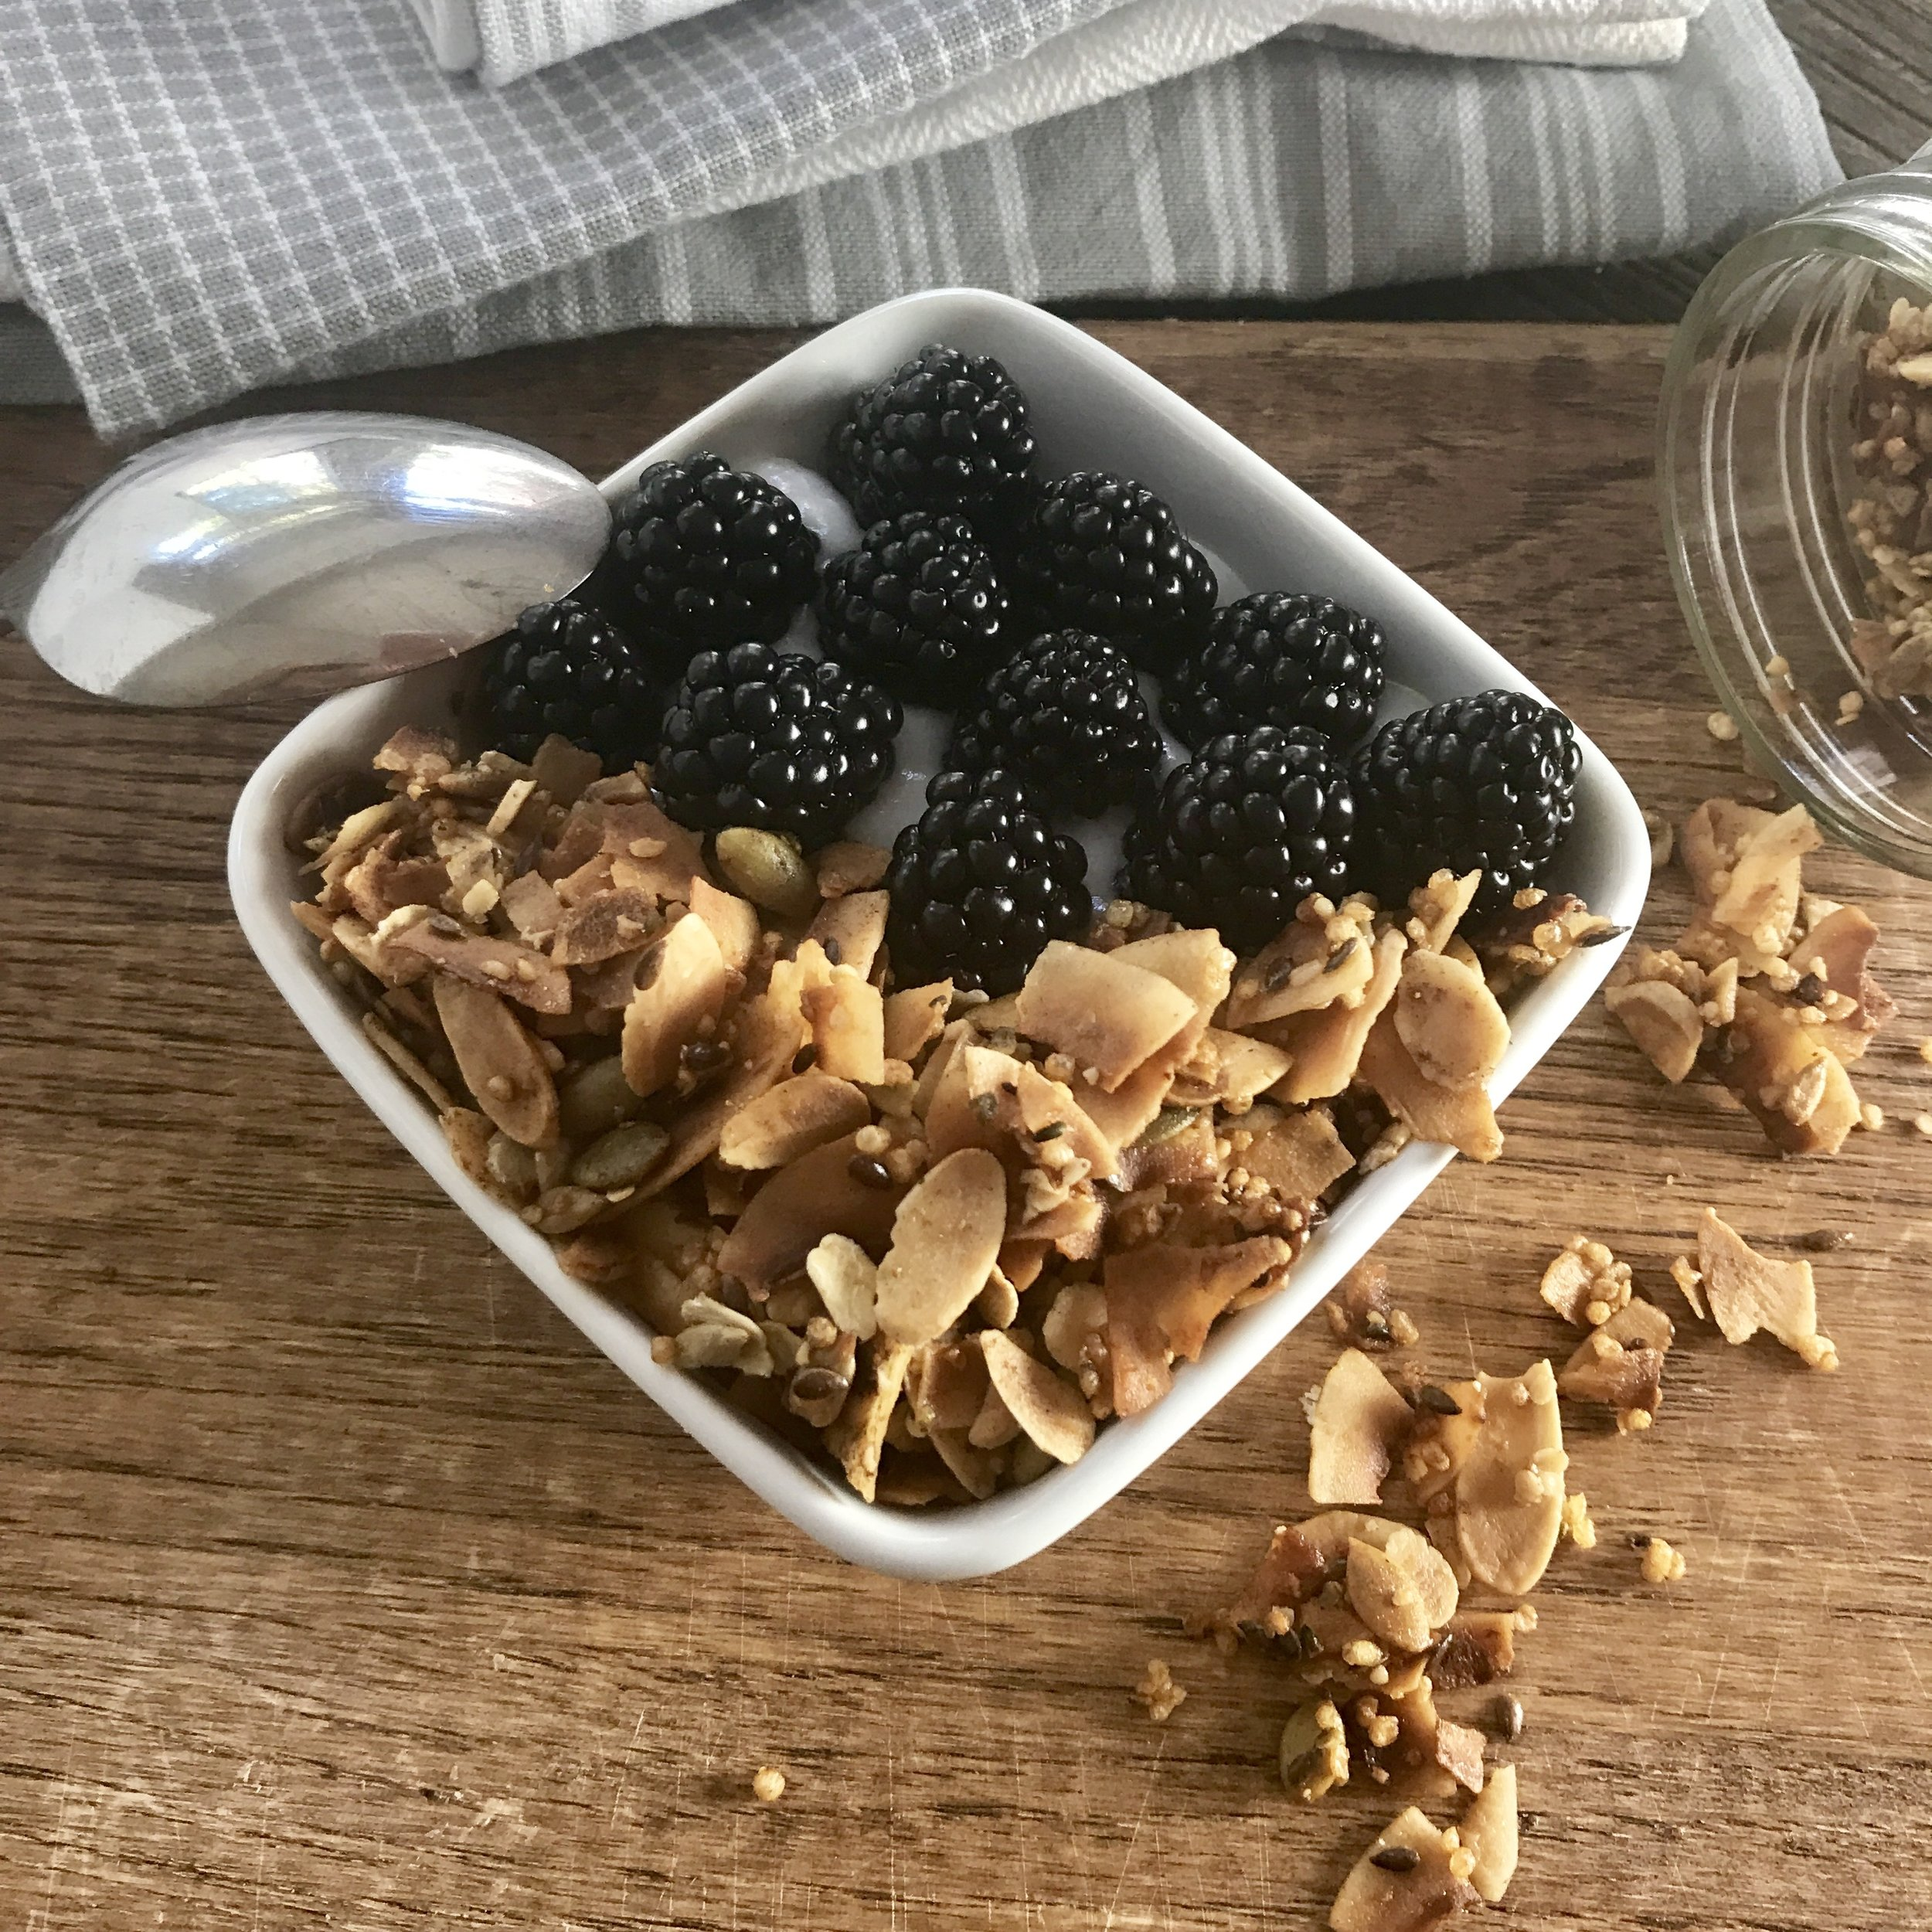 Coconut Flakes, Sliced Almonds, Flax Seeds, Hemp Seeds, Sunflower Seeds, Pumpkin Seeds and Puffed Quinoa